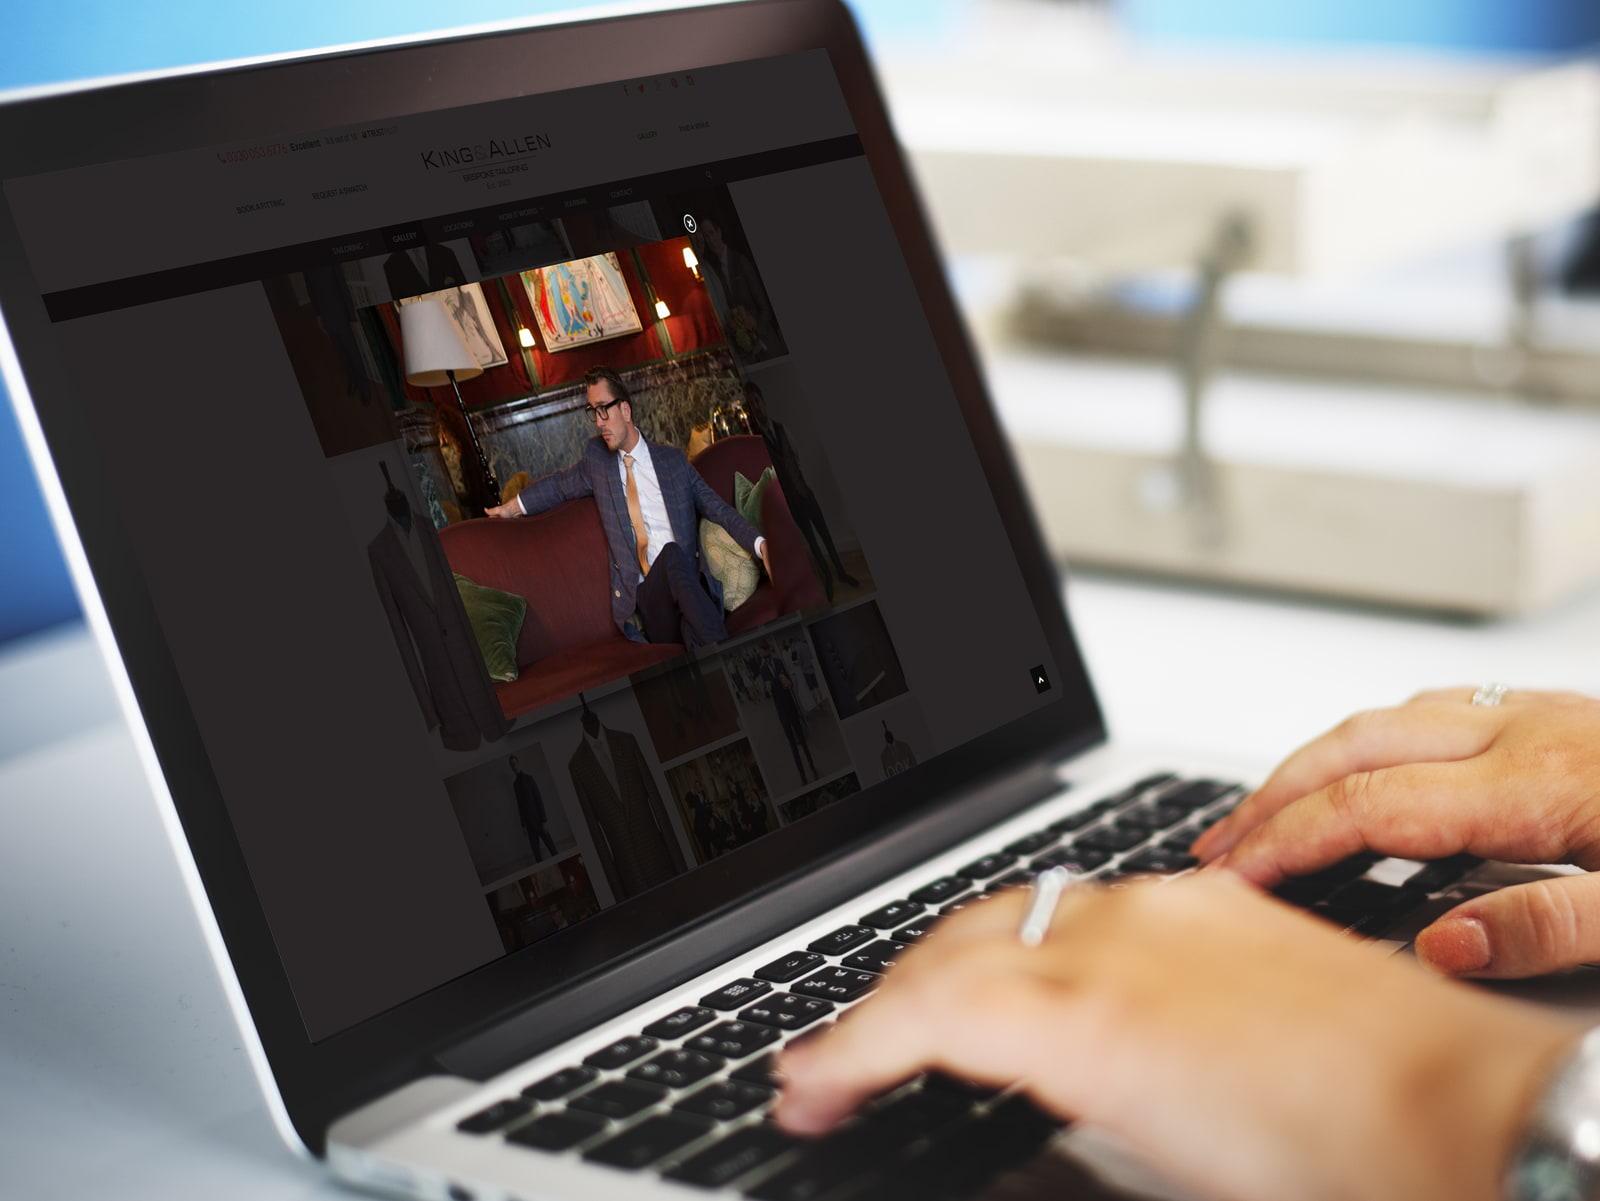 Bespoke WordPress web design from JJ Solutions in Surbiton